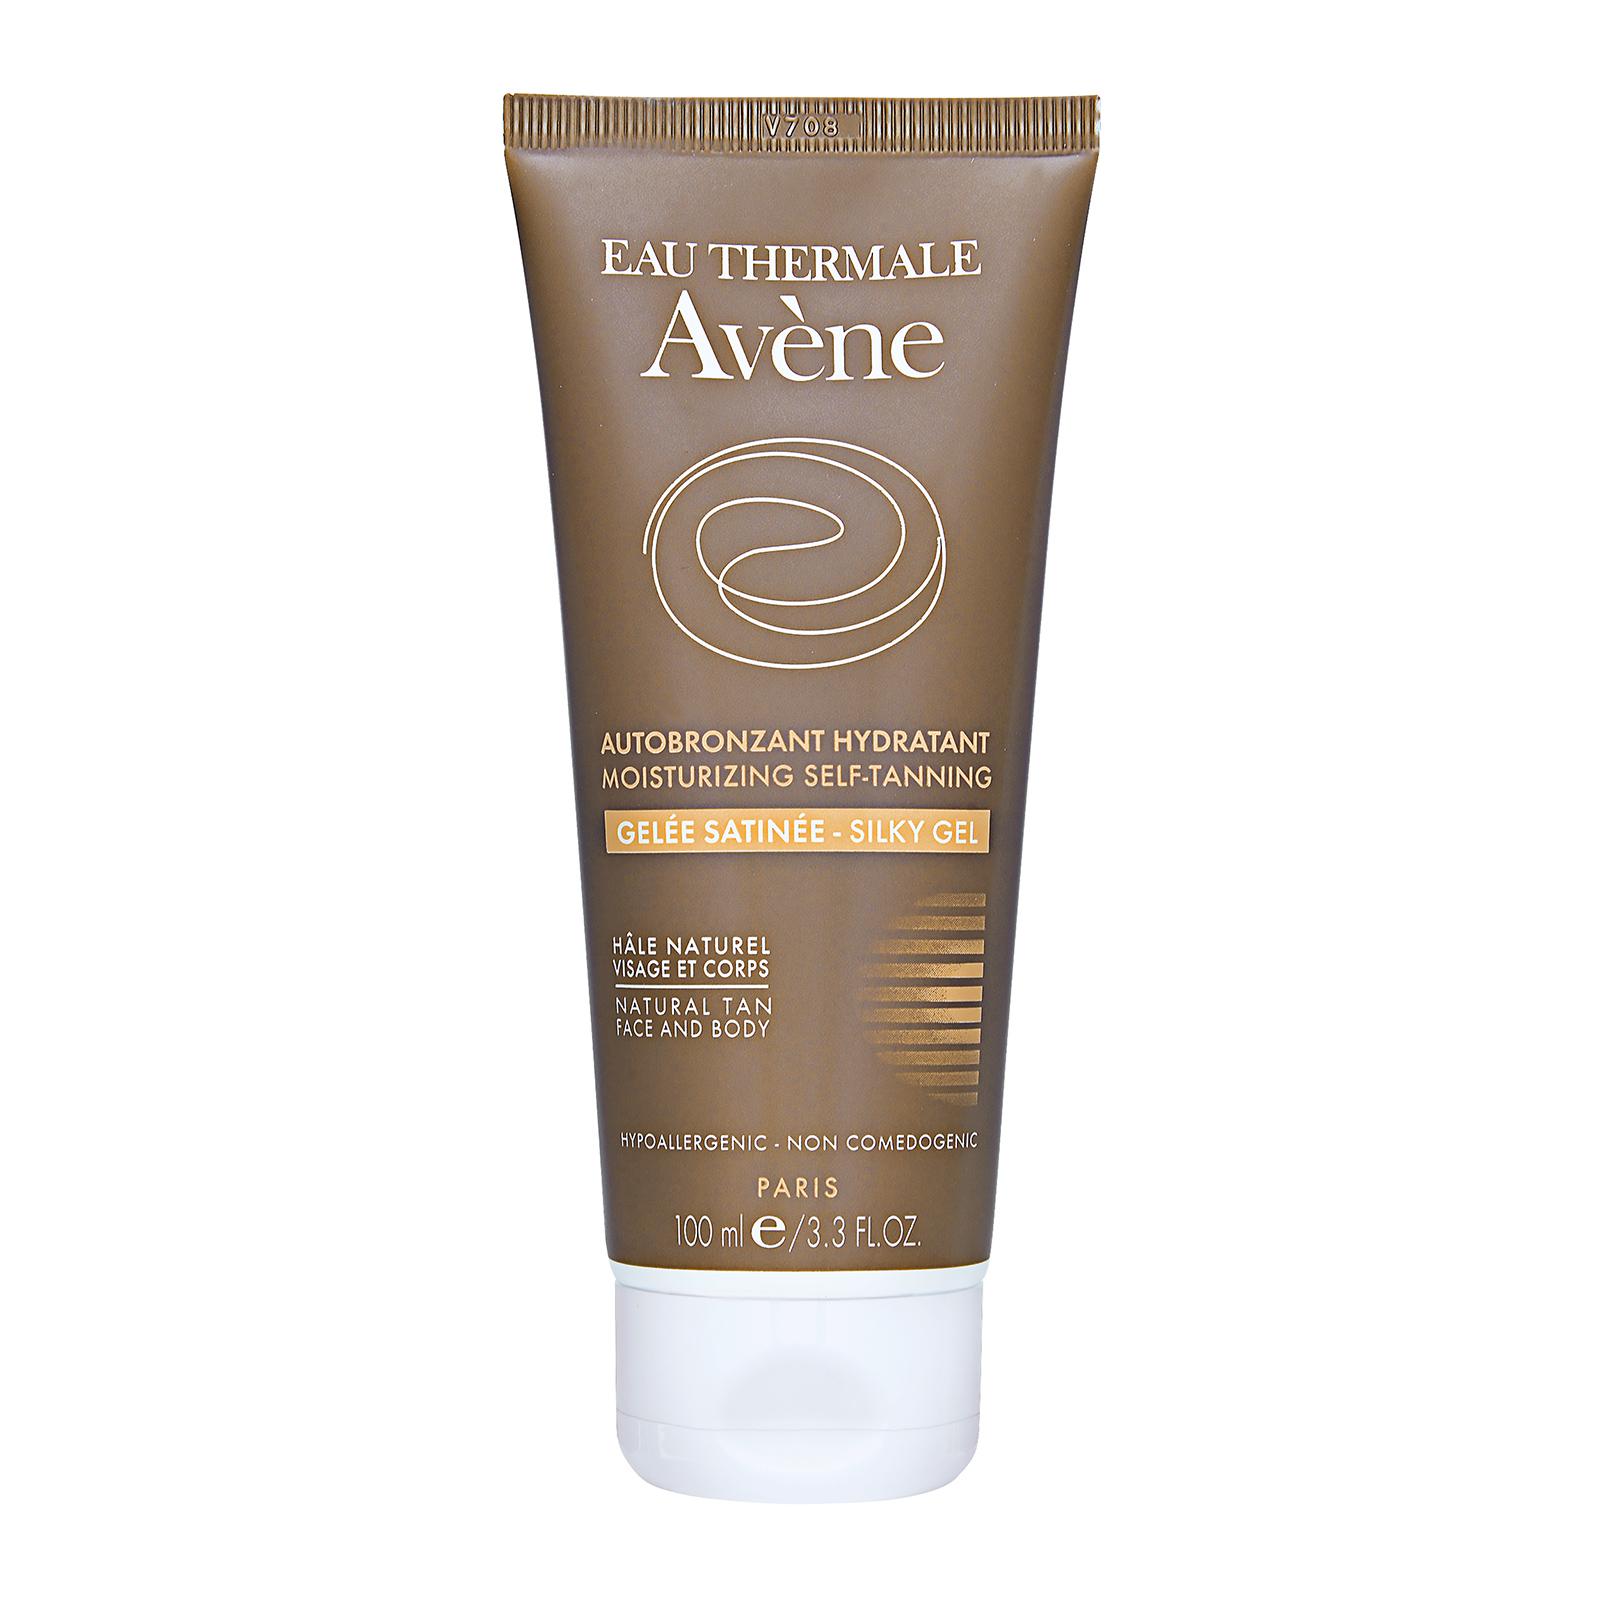 Autobronzant Avene Silky Sensitive Gel Hydratant For Moisturizing MUpzVS